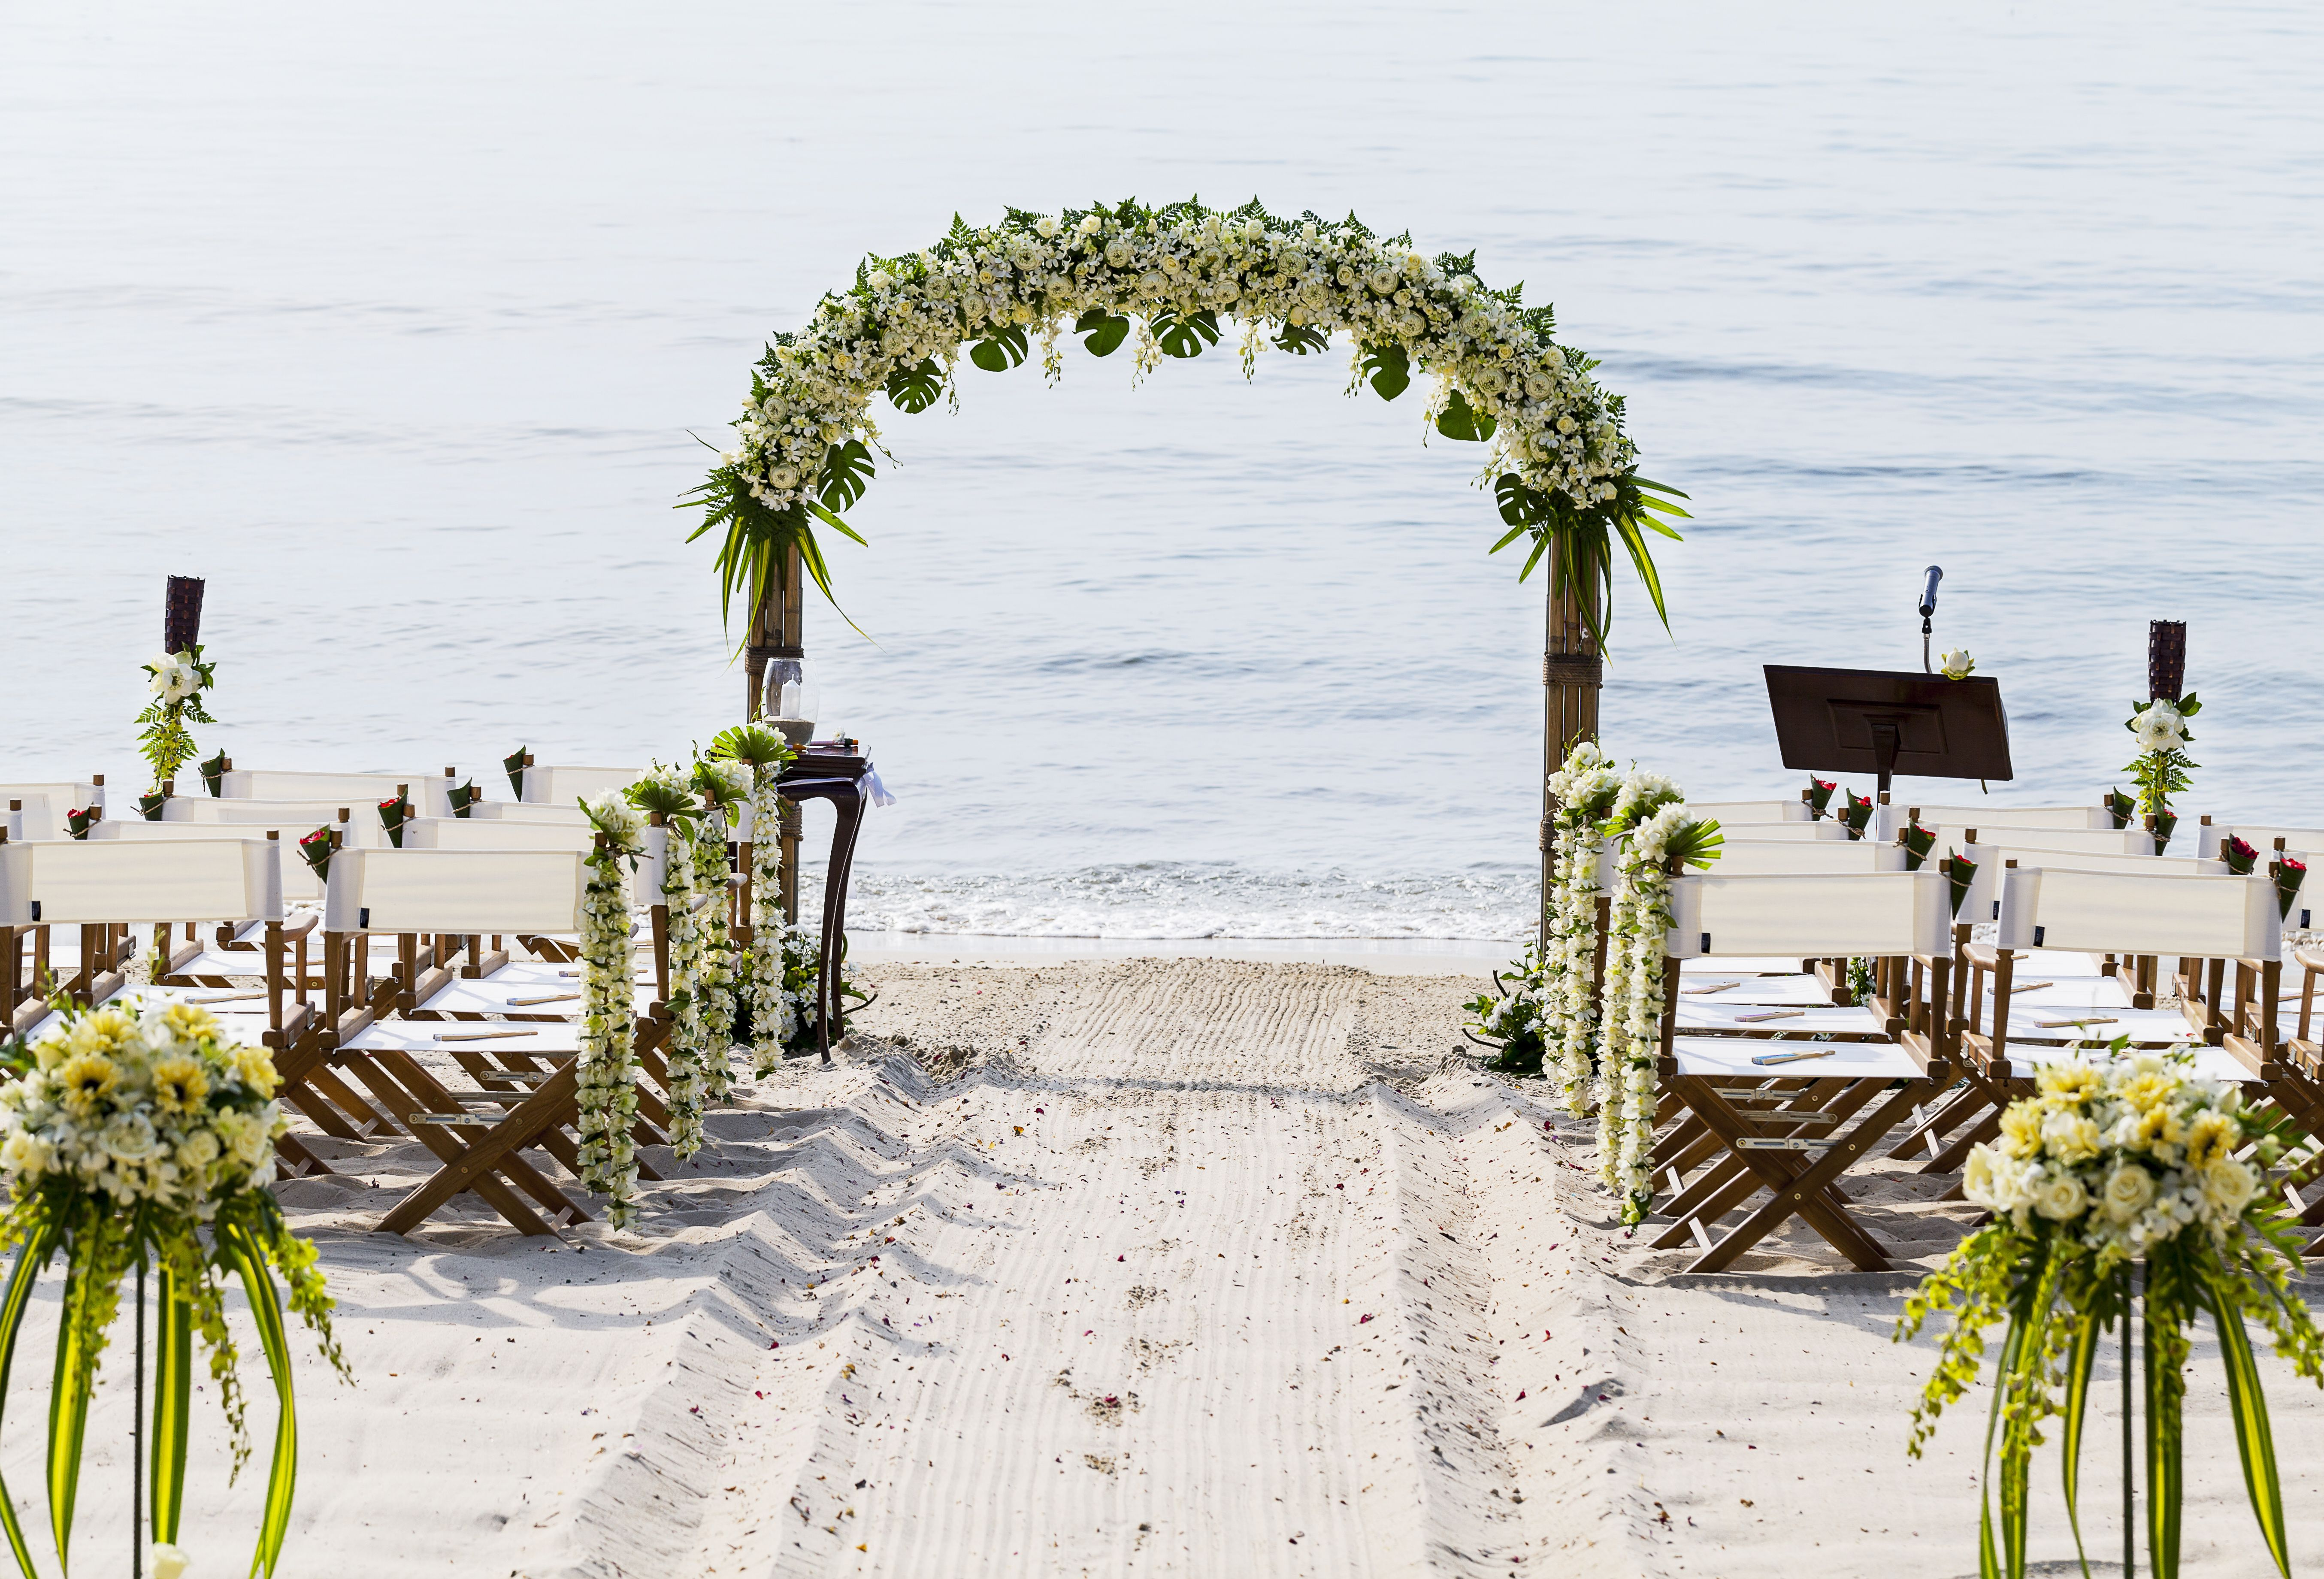 Hindu wedding planners in India - Plan your hindu wedding with us ...